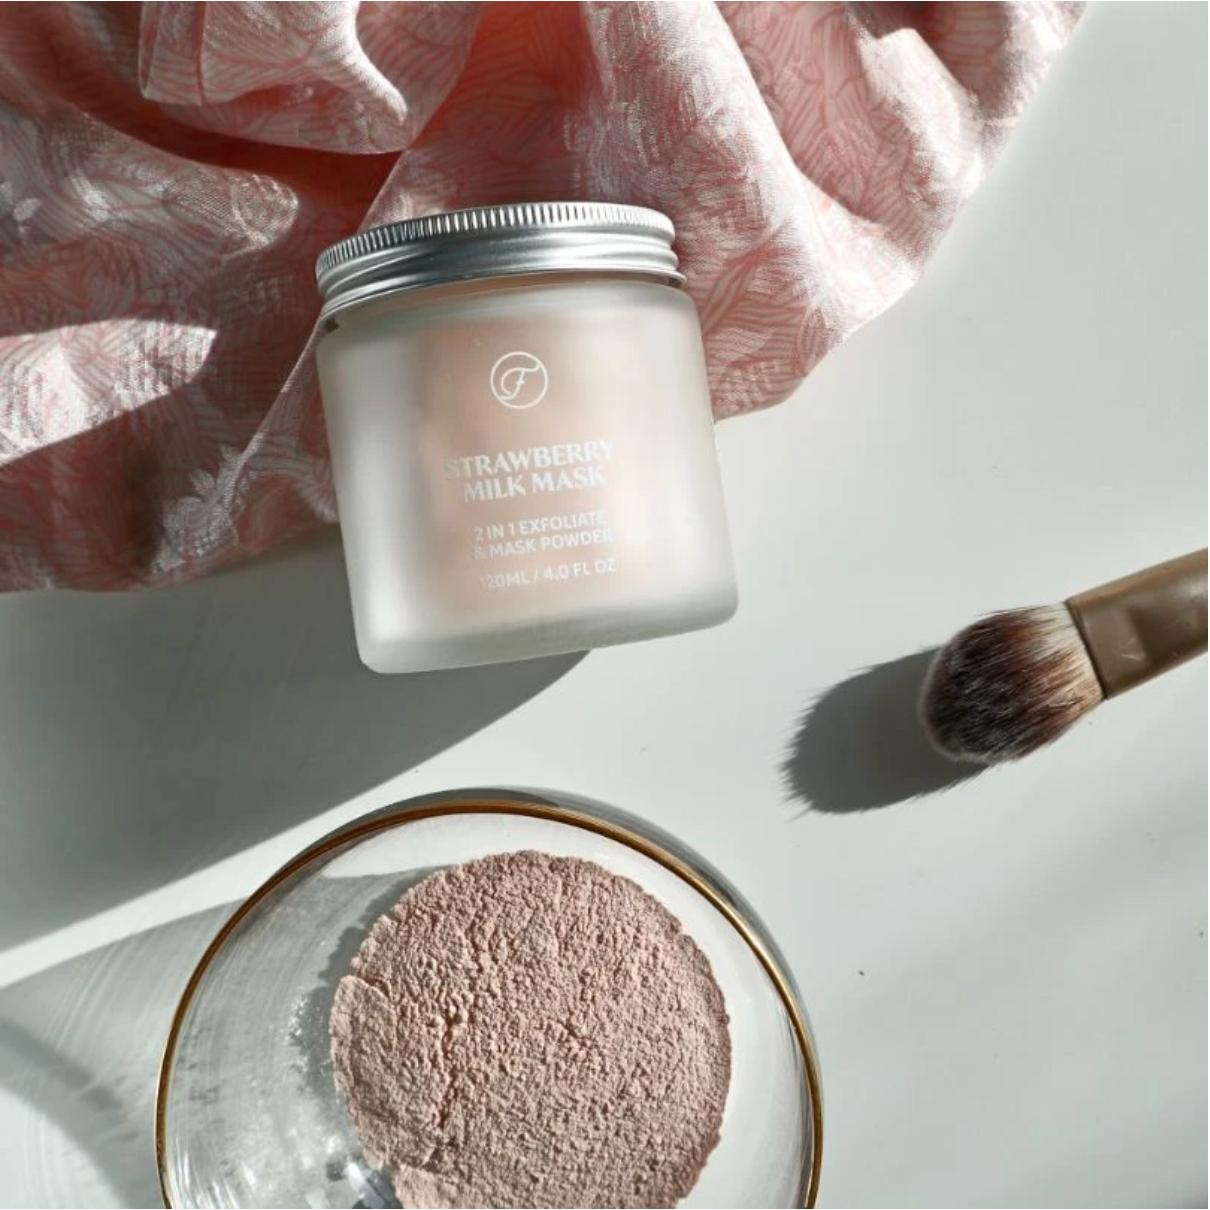 Strawberry Milk Mask -2 in 1- Flow Cosmetics-2